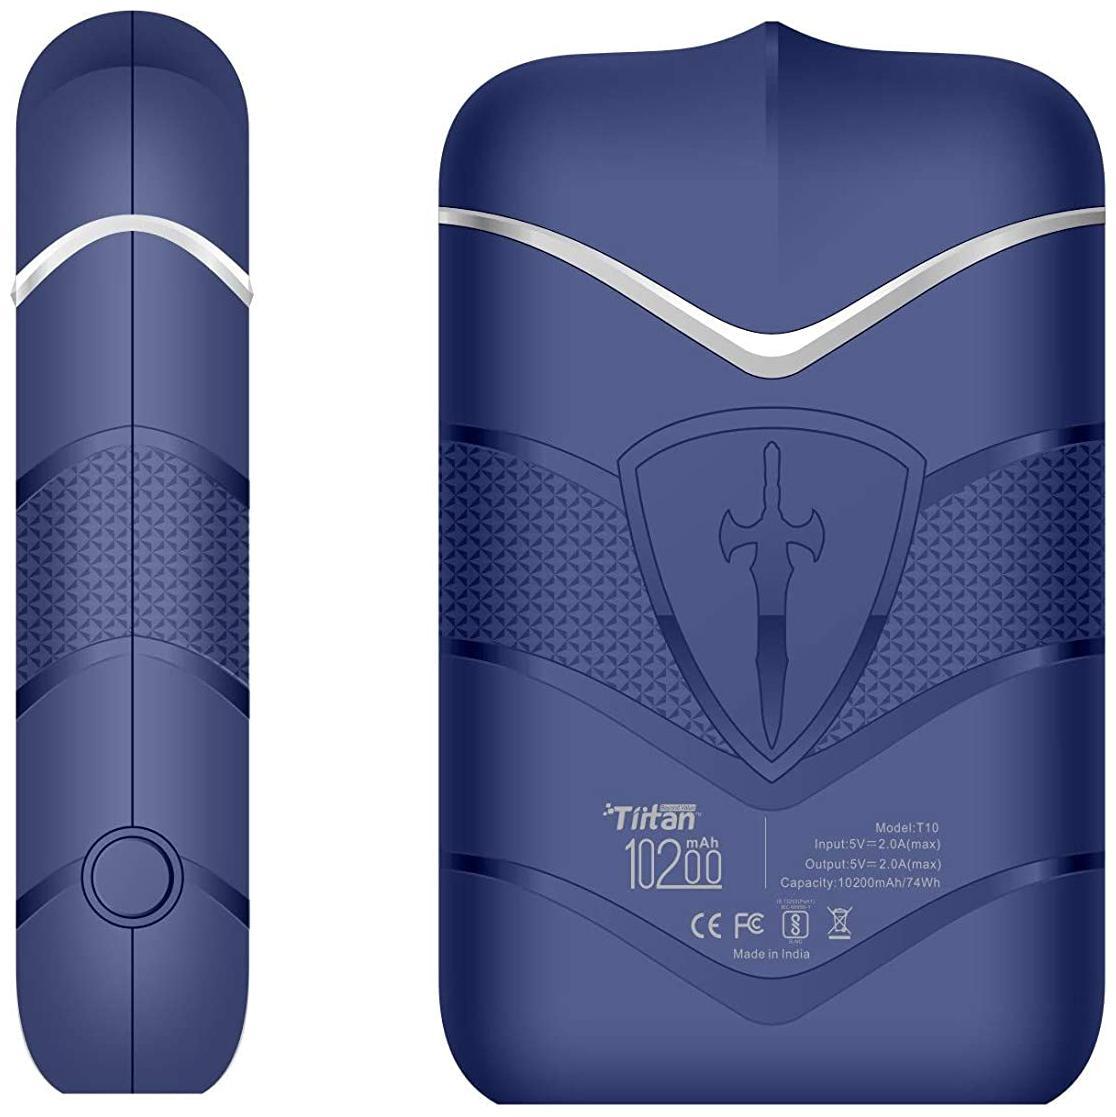 Tiitan P1020 10200 mAh Portable Power Bank - Blue